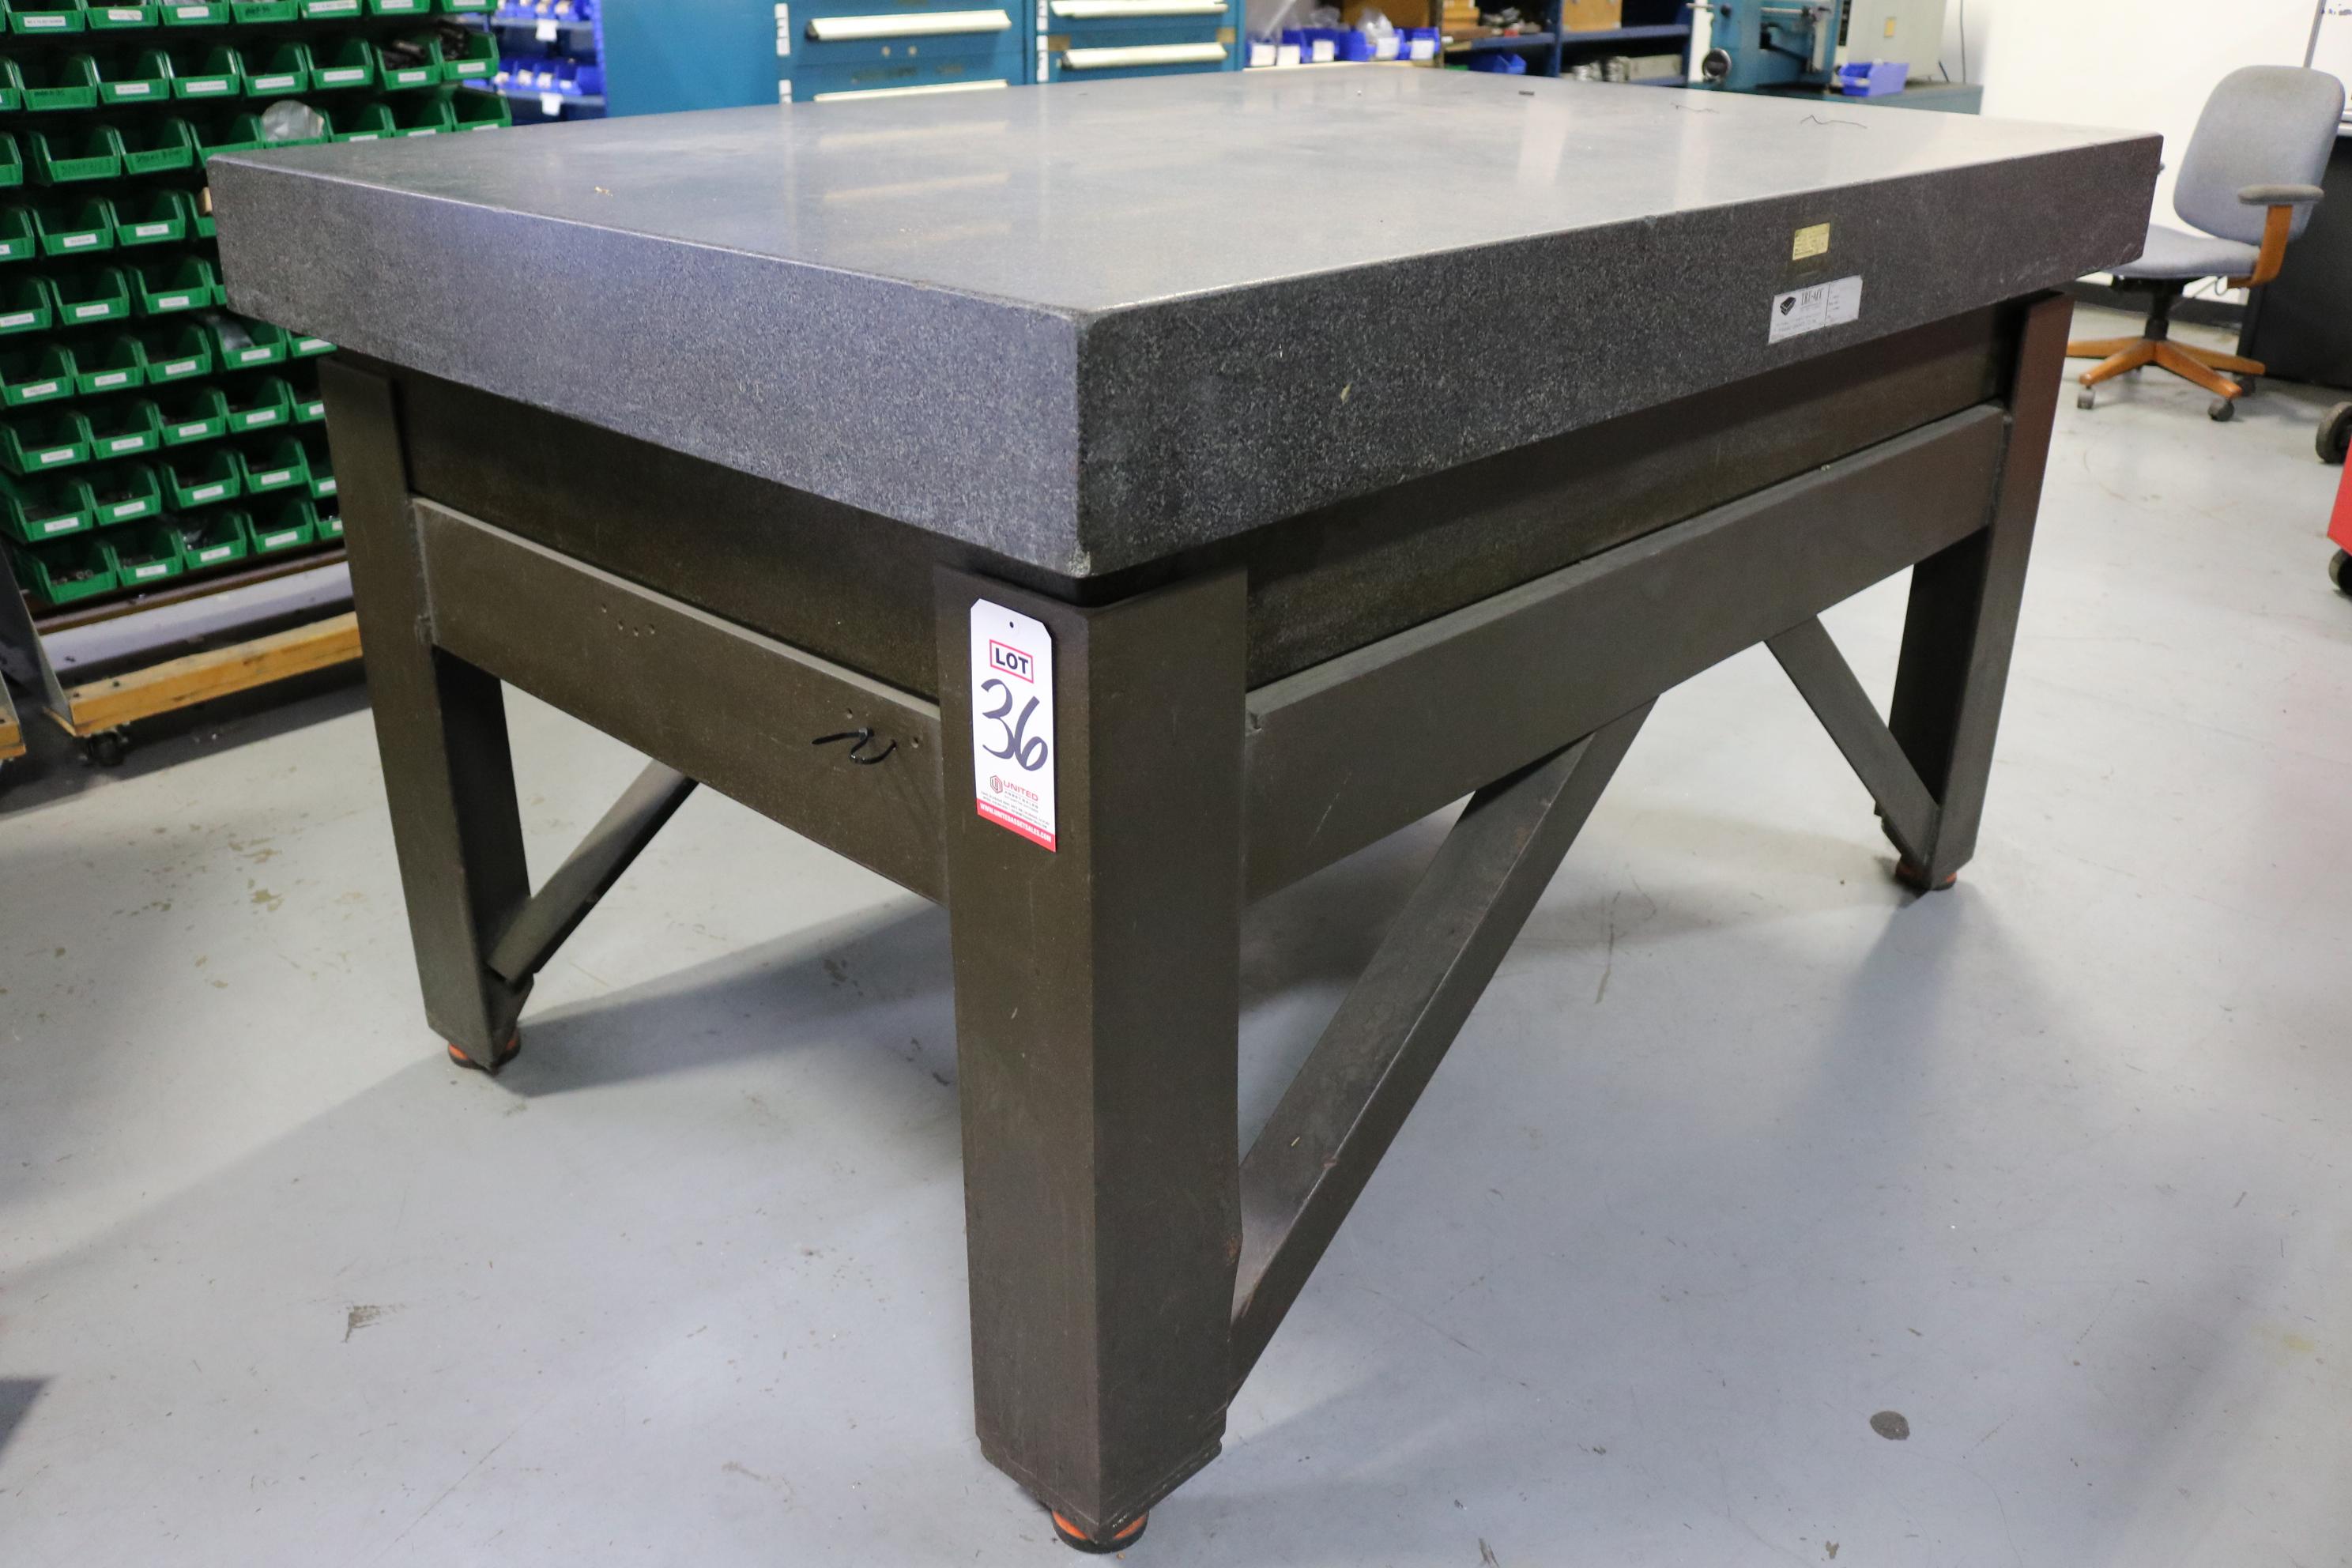 "Lot 36 - MICRO-FLAT GRANITE SURFACE PLATE, 6' X 4' X 6"", STEEL METAL TABLE"